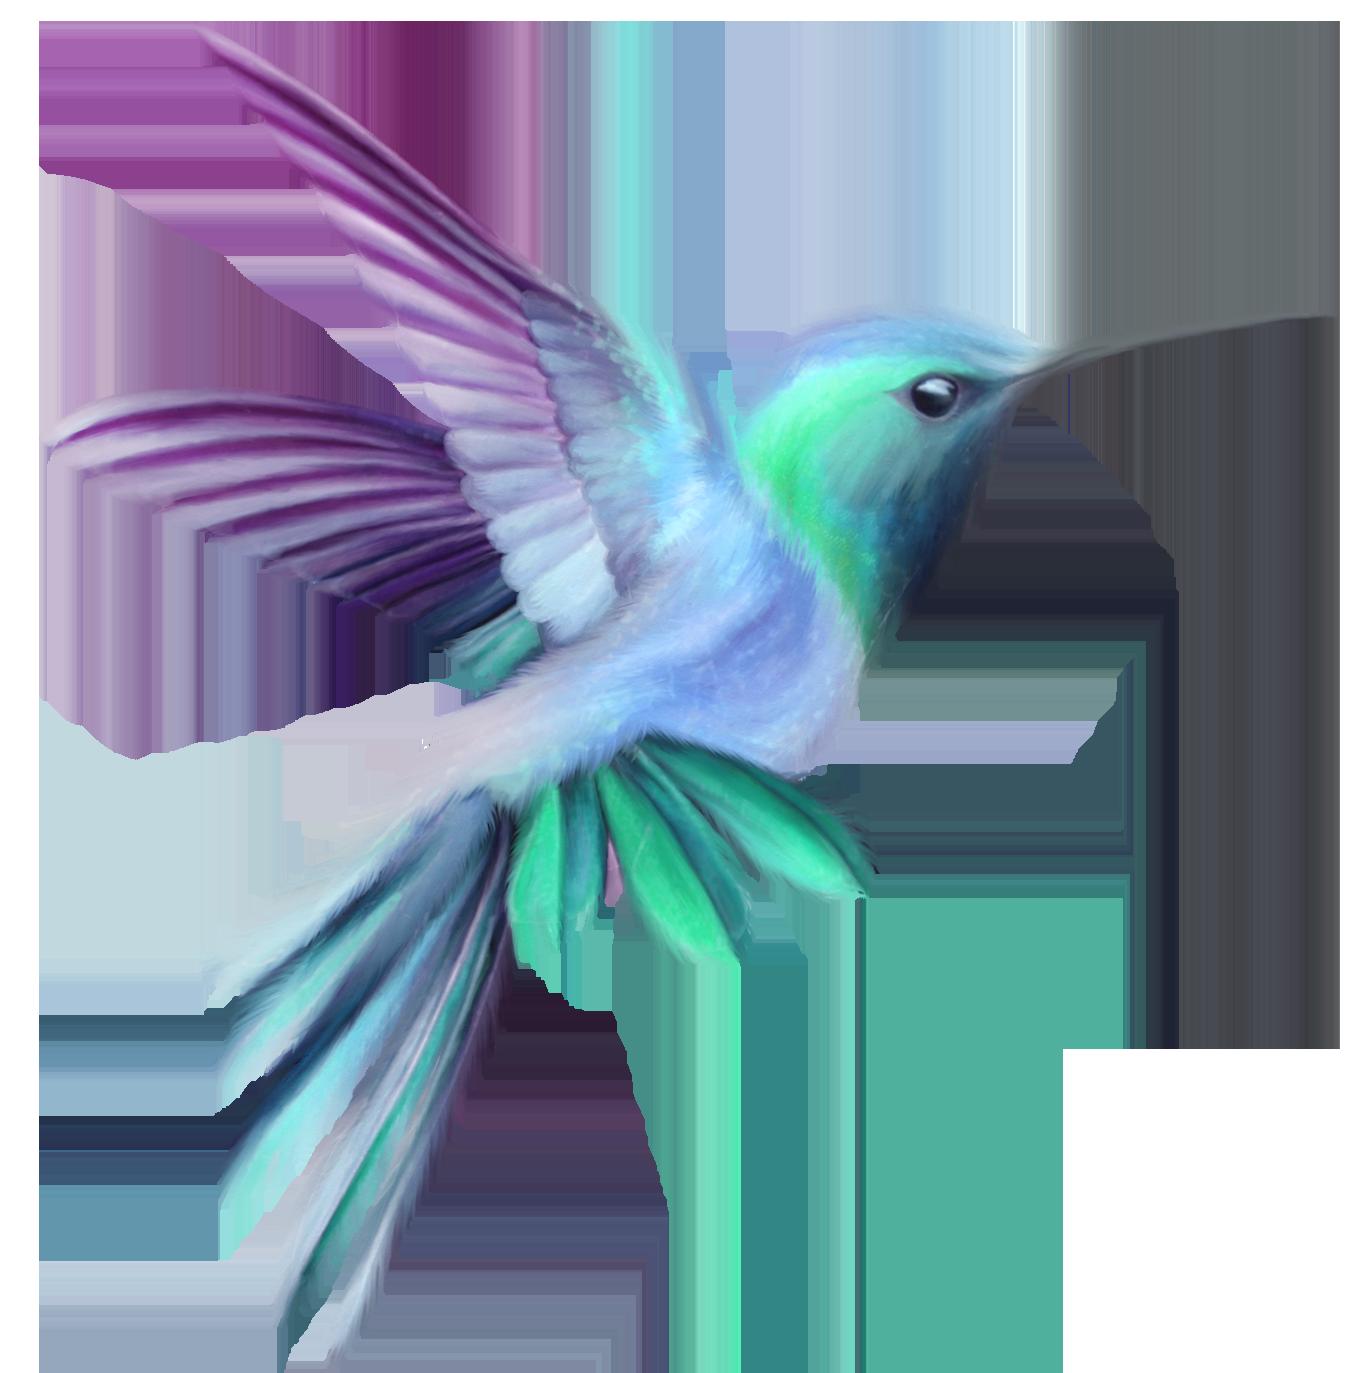 Transparent clip art image. Hummingbird clipart